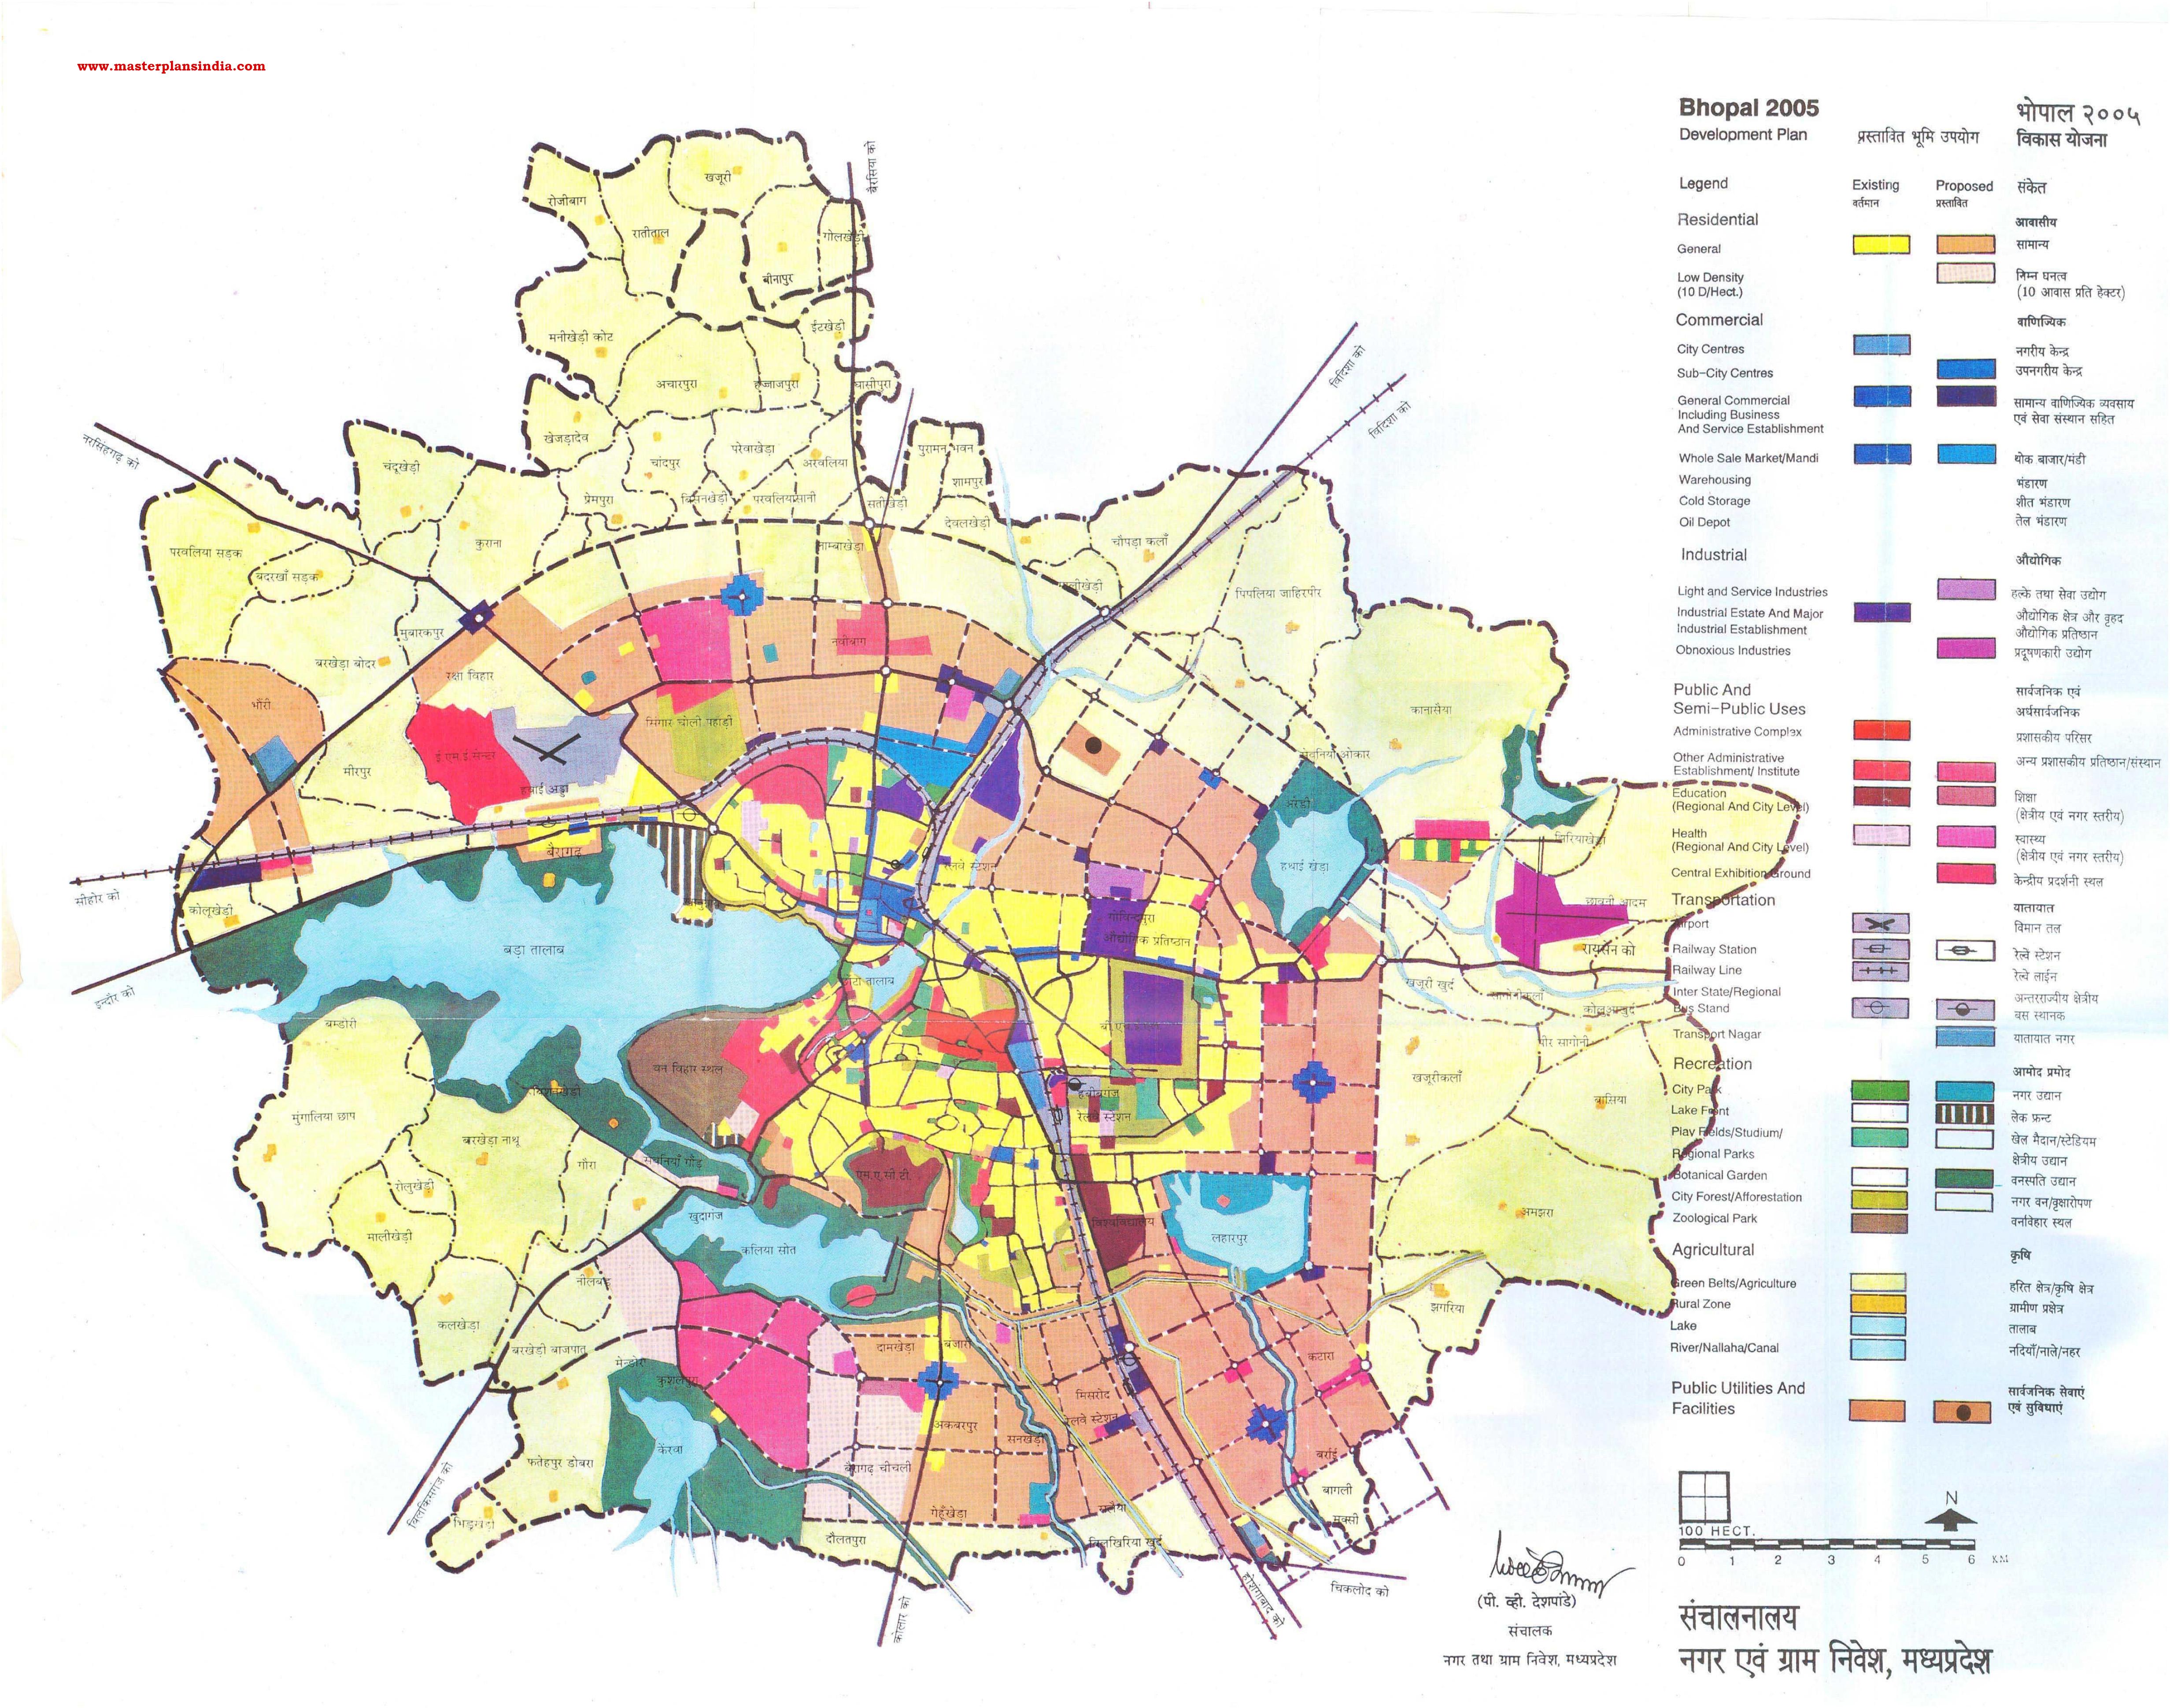 Bhopal master plan 2021 map | Download Free Printable Graphics